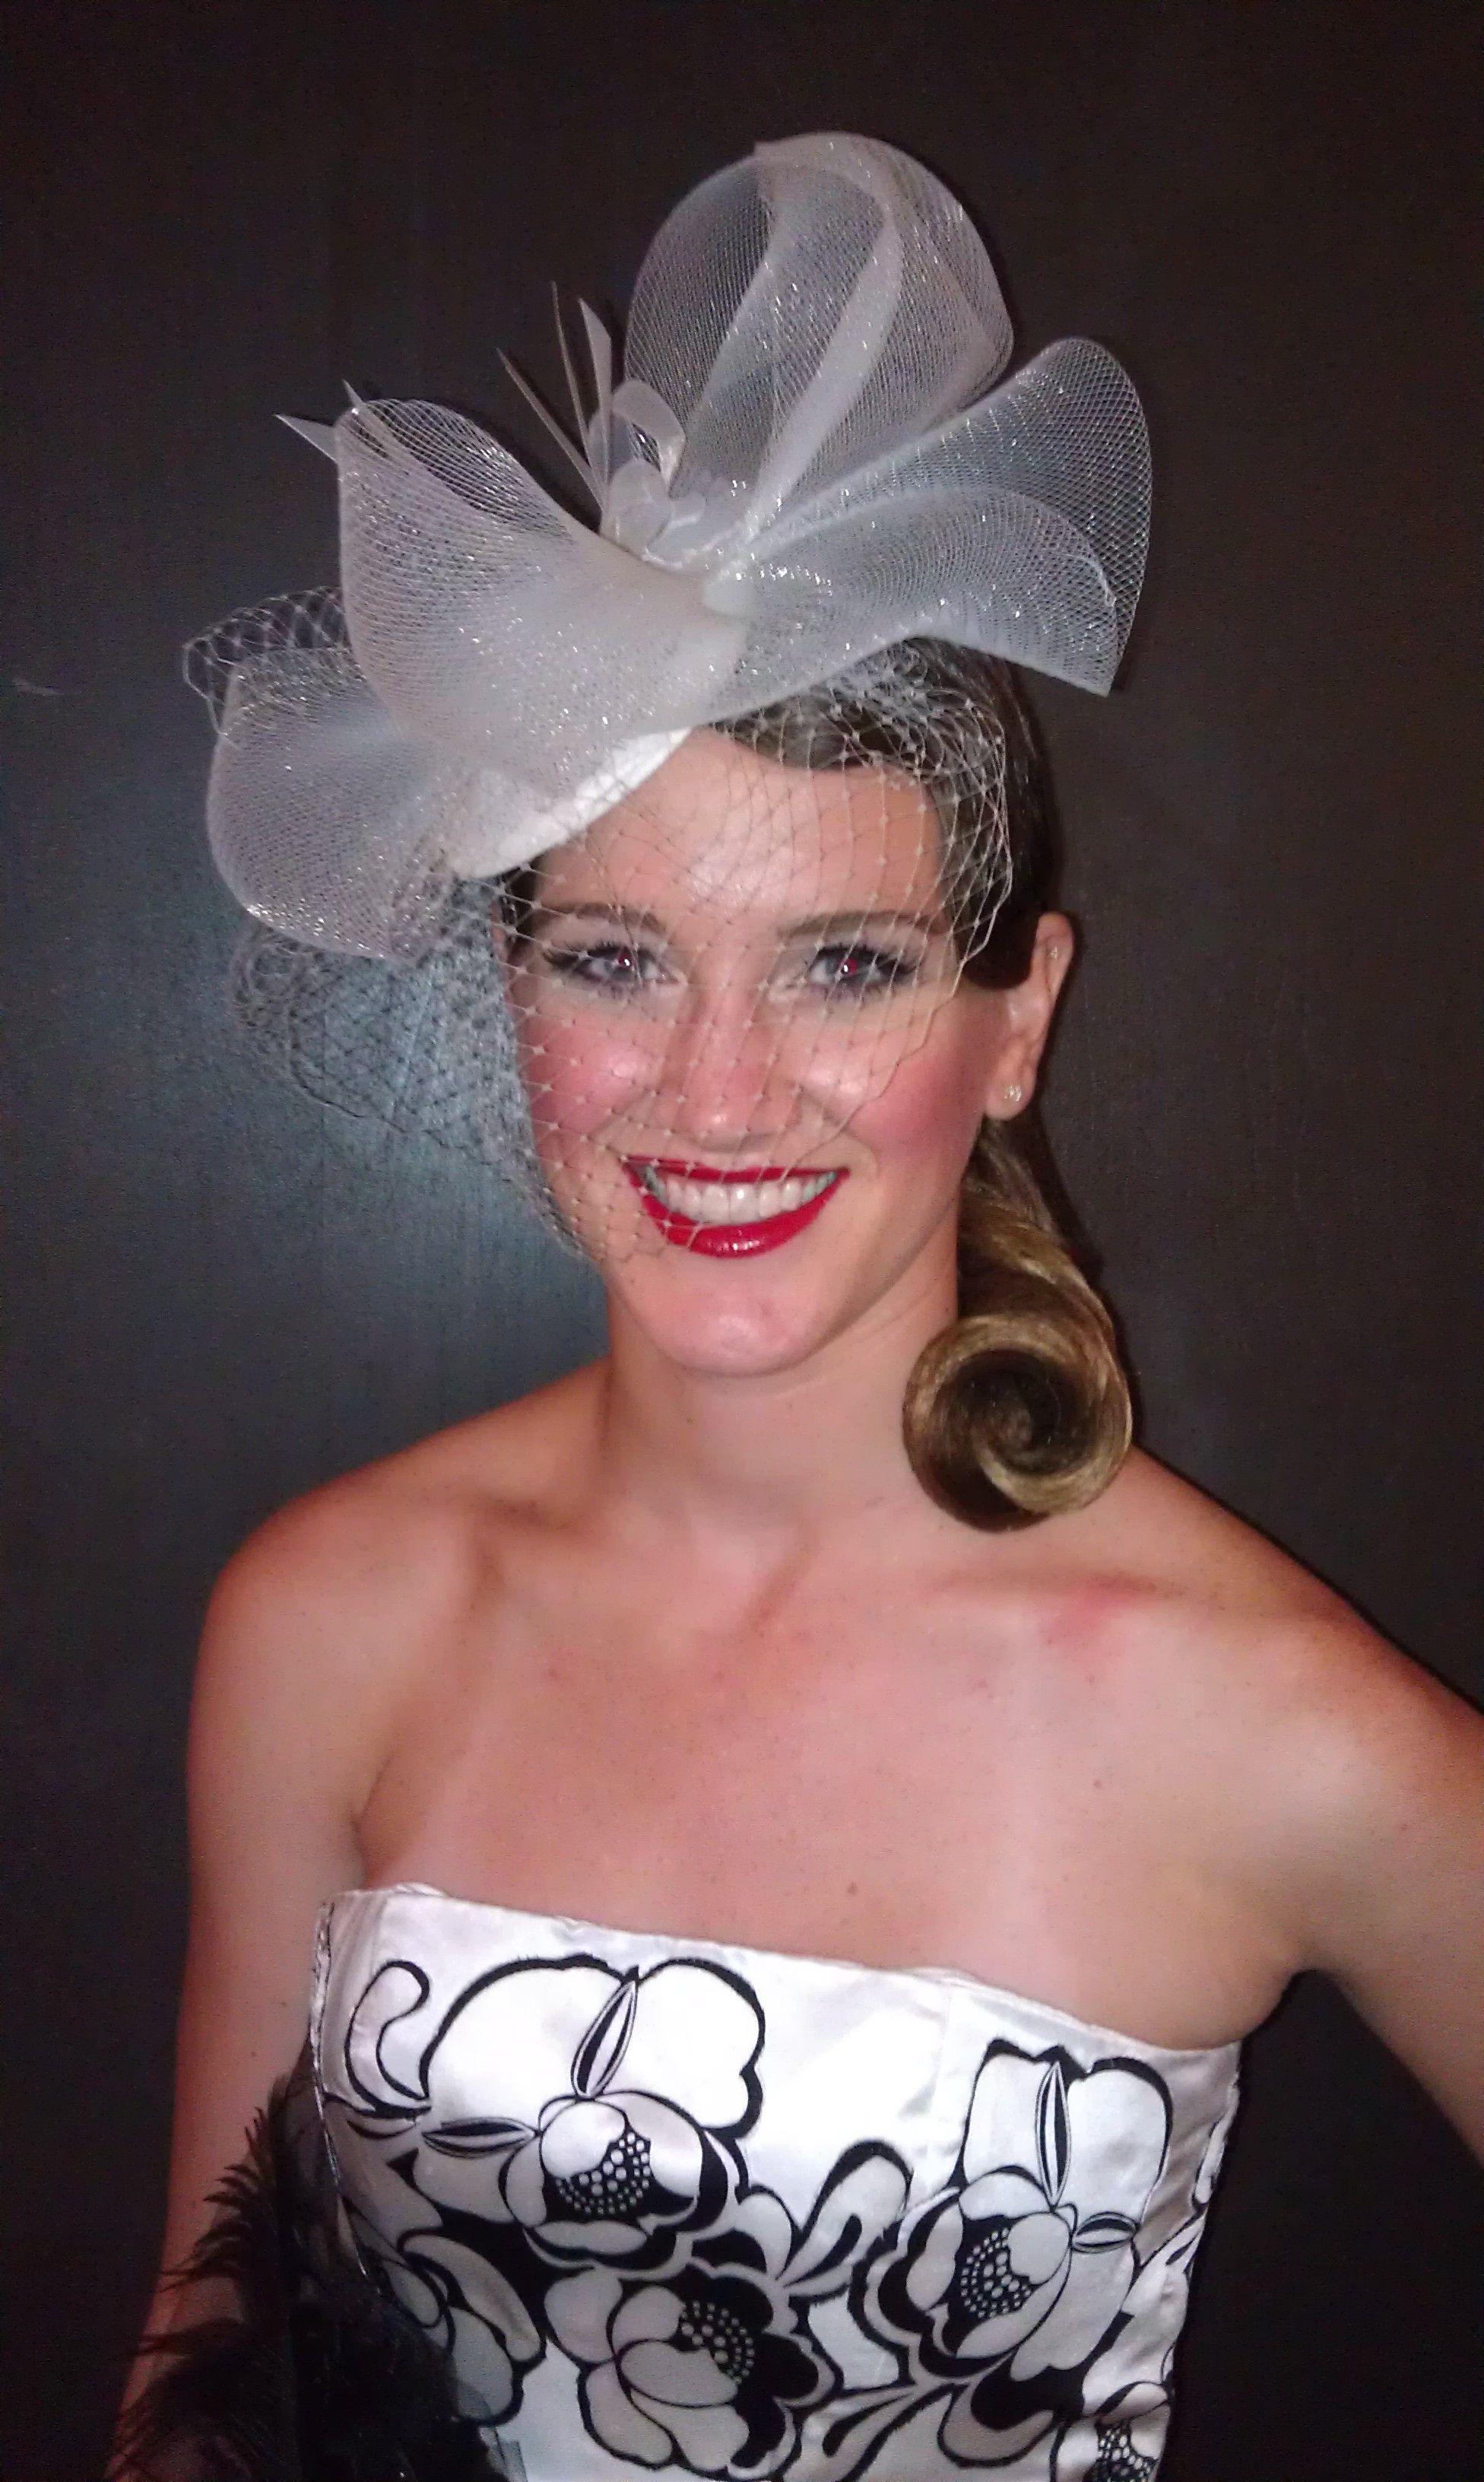 Custom wedding dress designers  Teeara Headpiece  Veils  Pinterest  Veil Headpieces and Custom